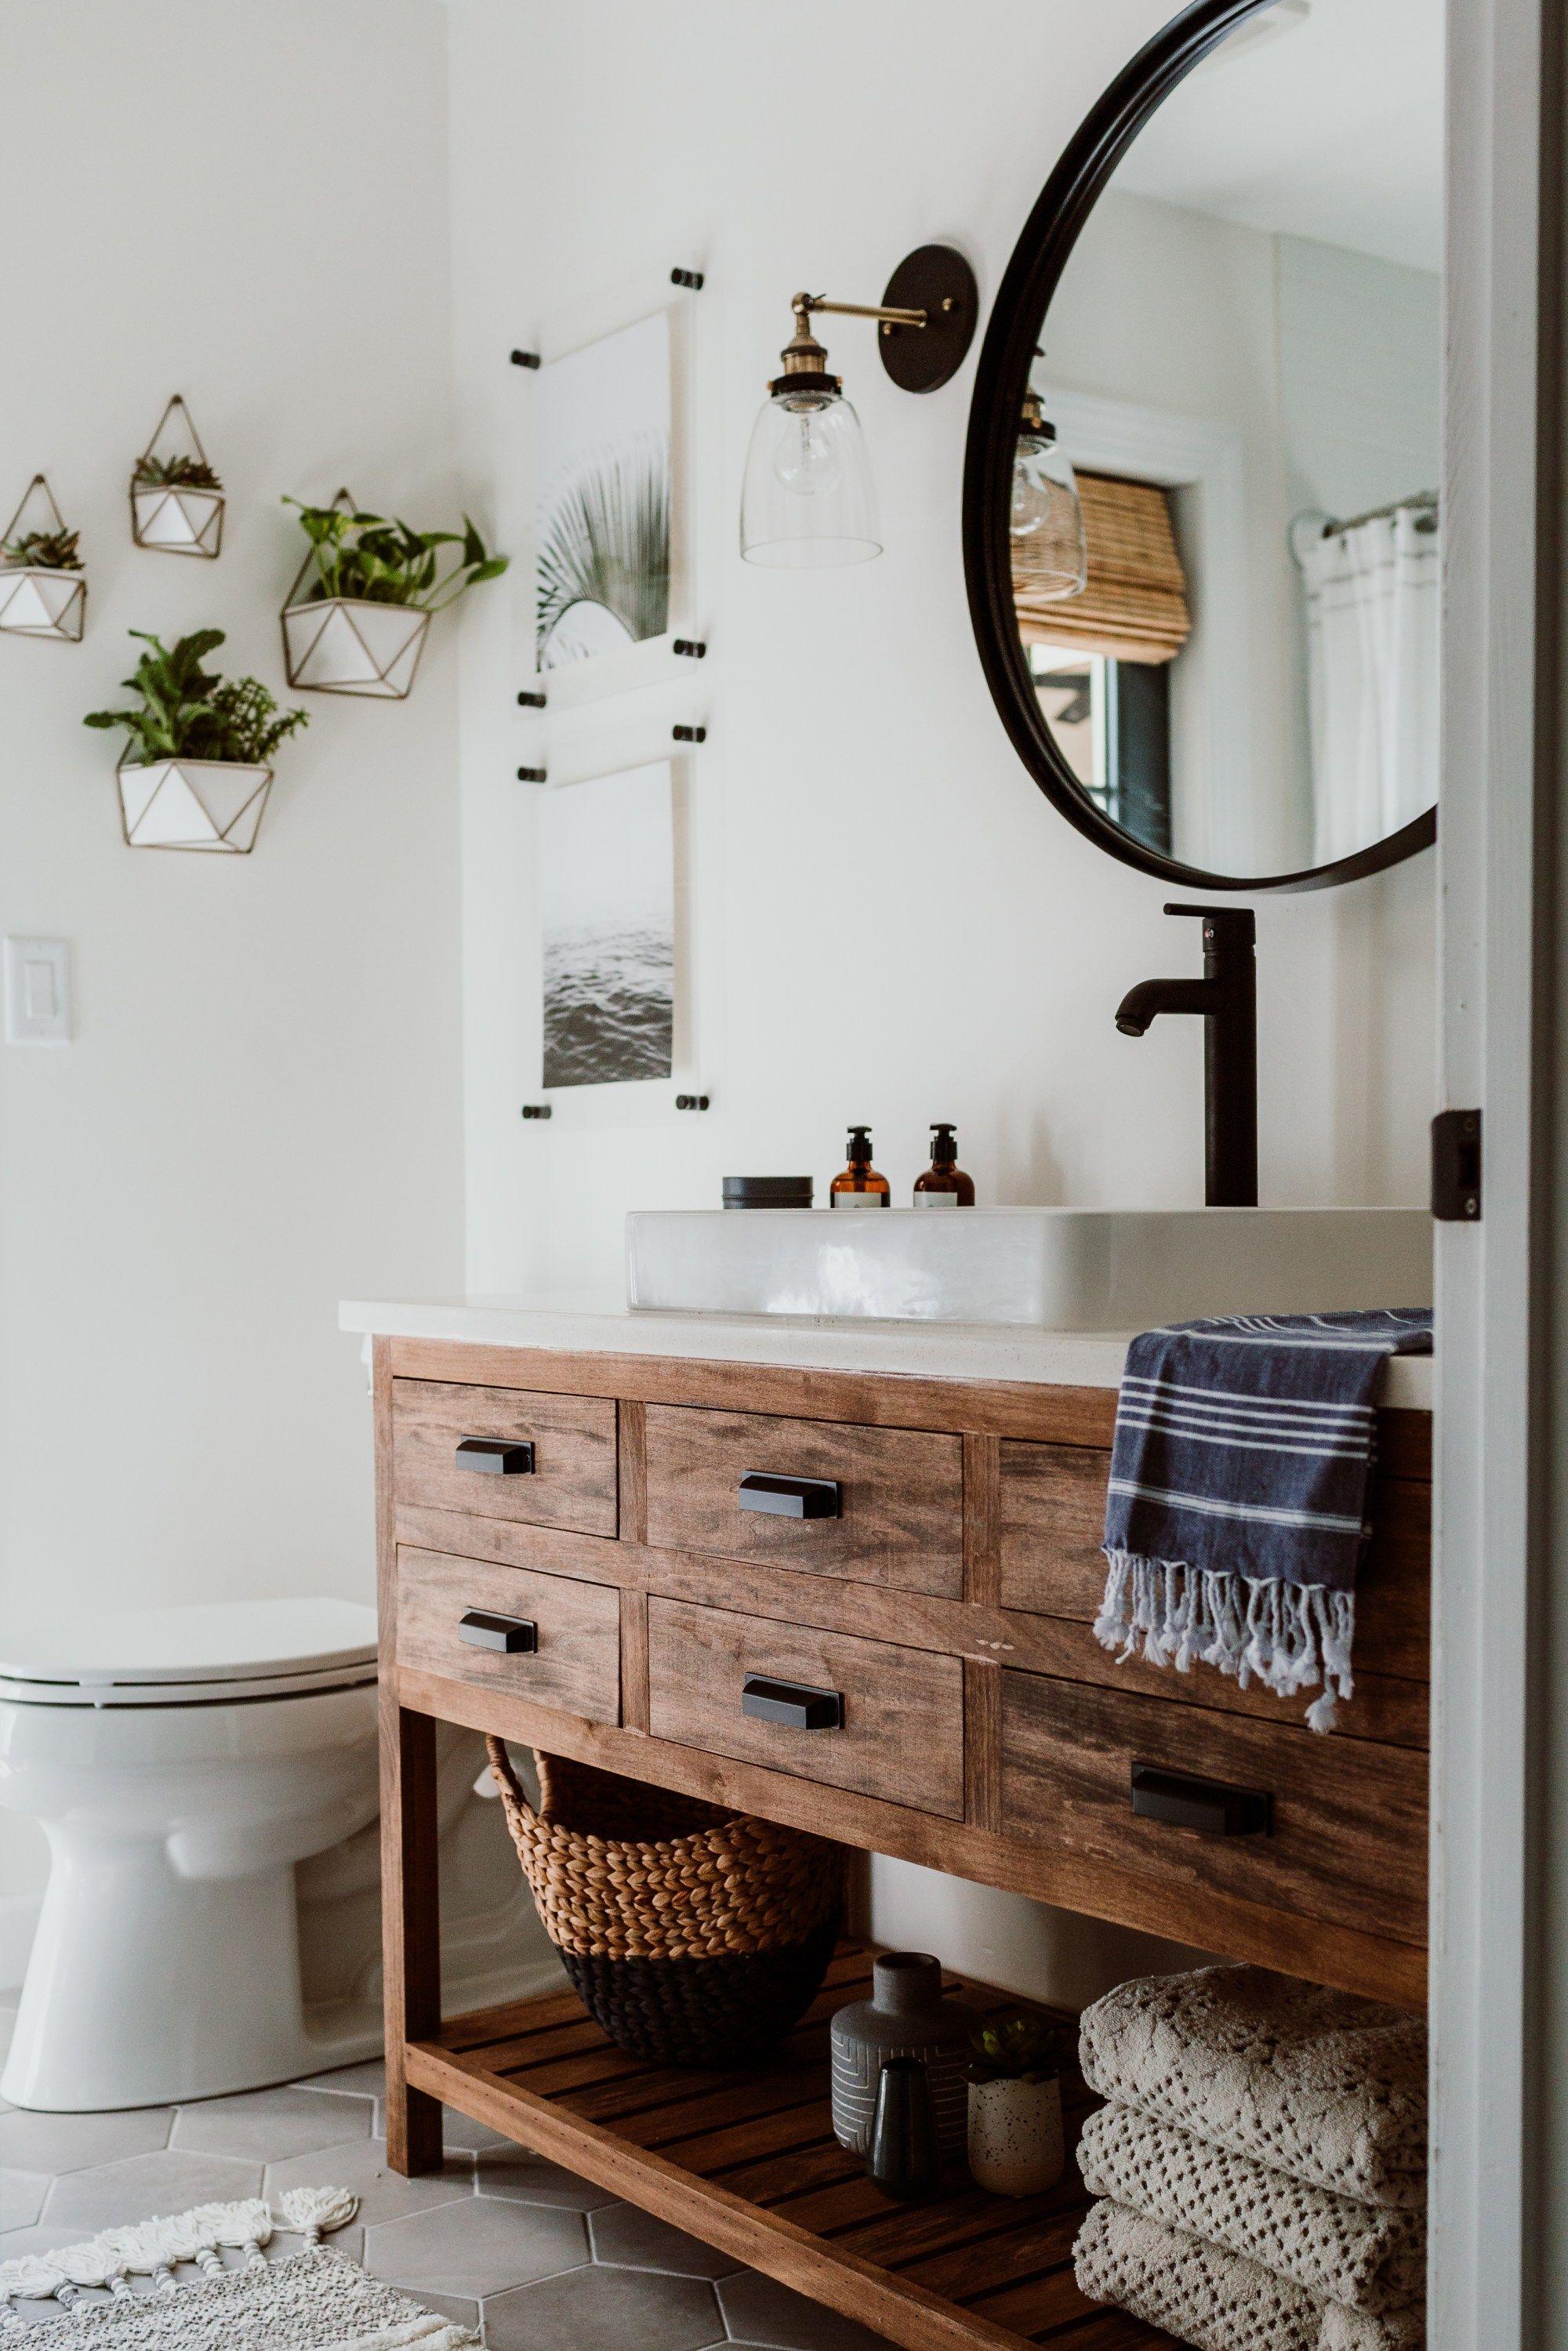 Modern Guest Bathroom Reveal One Room Challenge Week 6 Within The Grove Rustic Bathrooms Diy Bathroom Decor Bathroom Decor